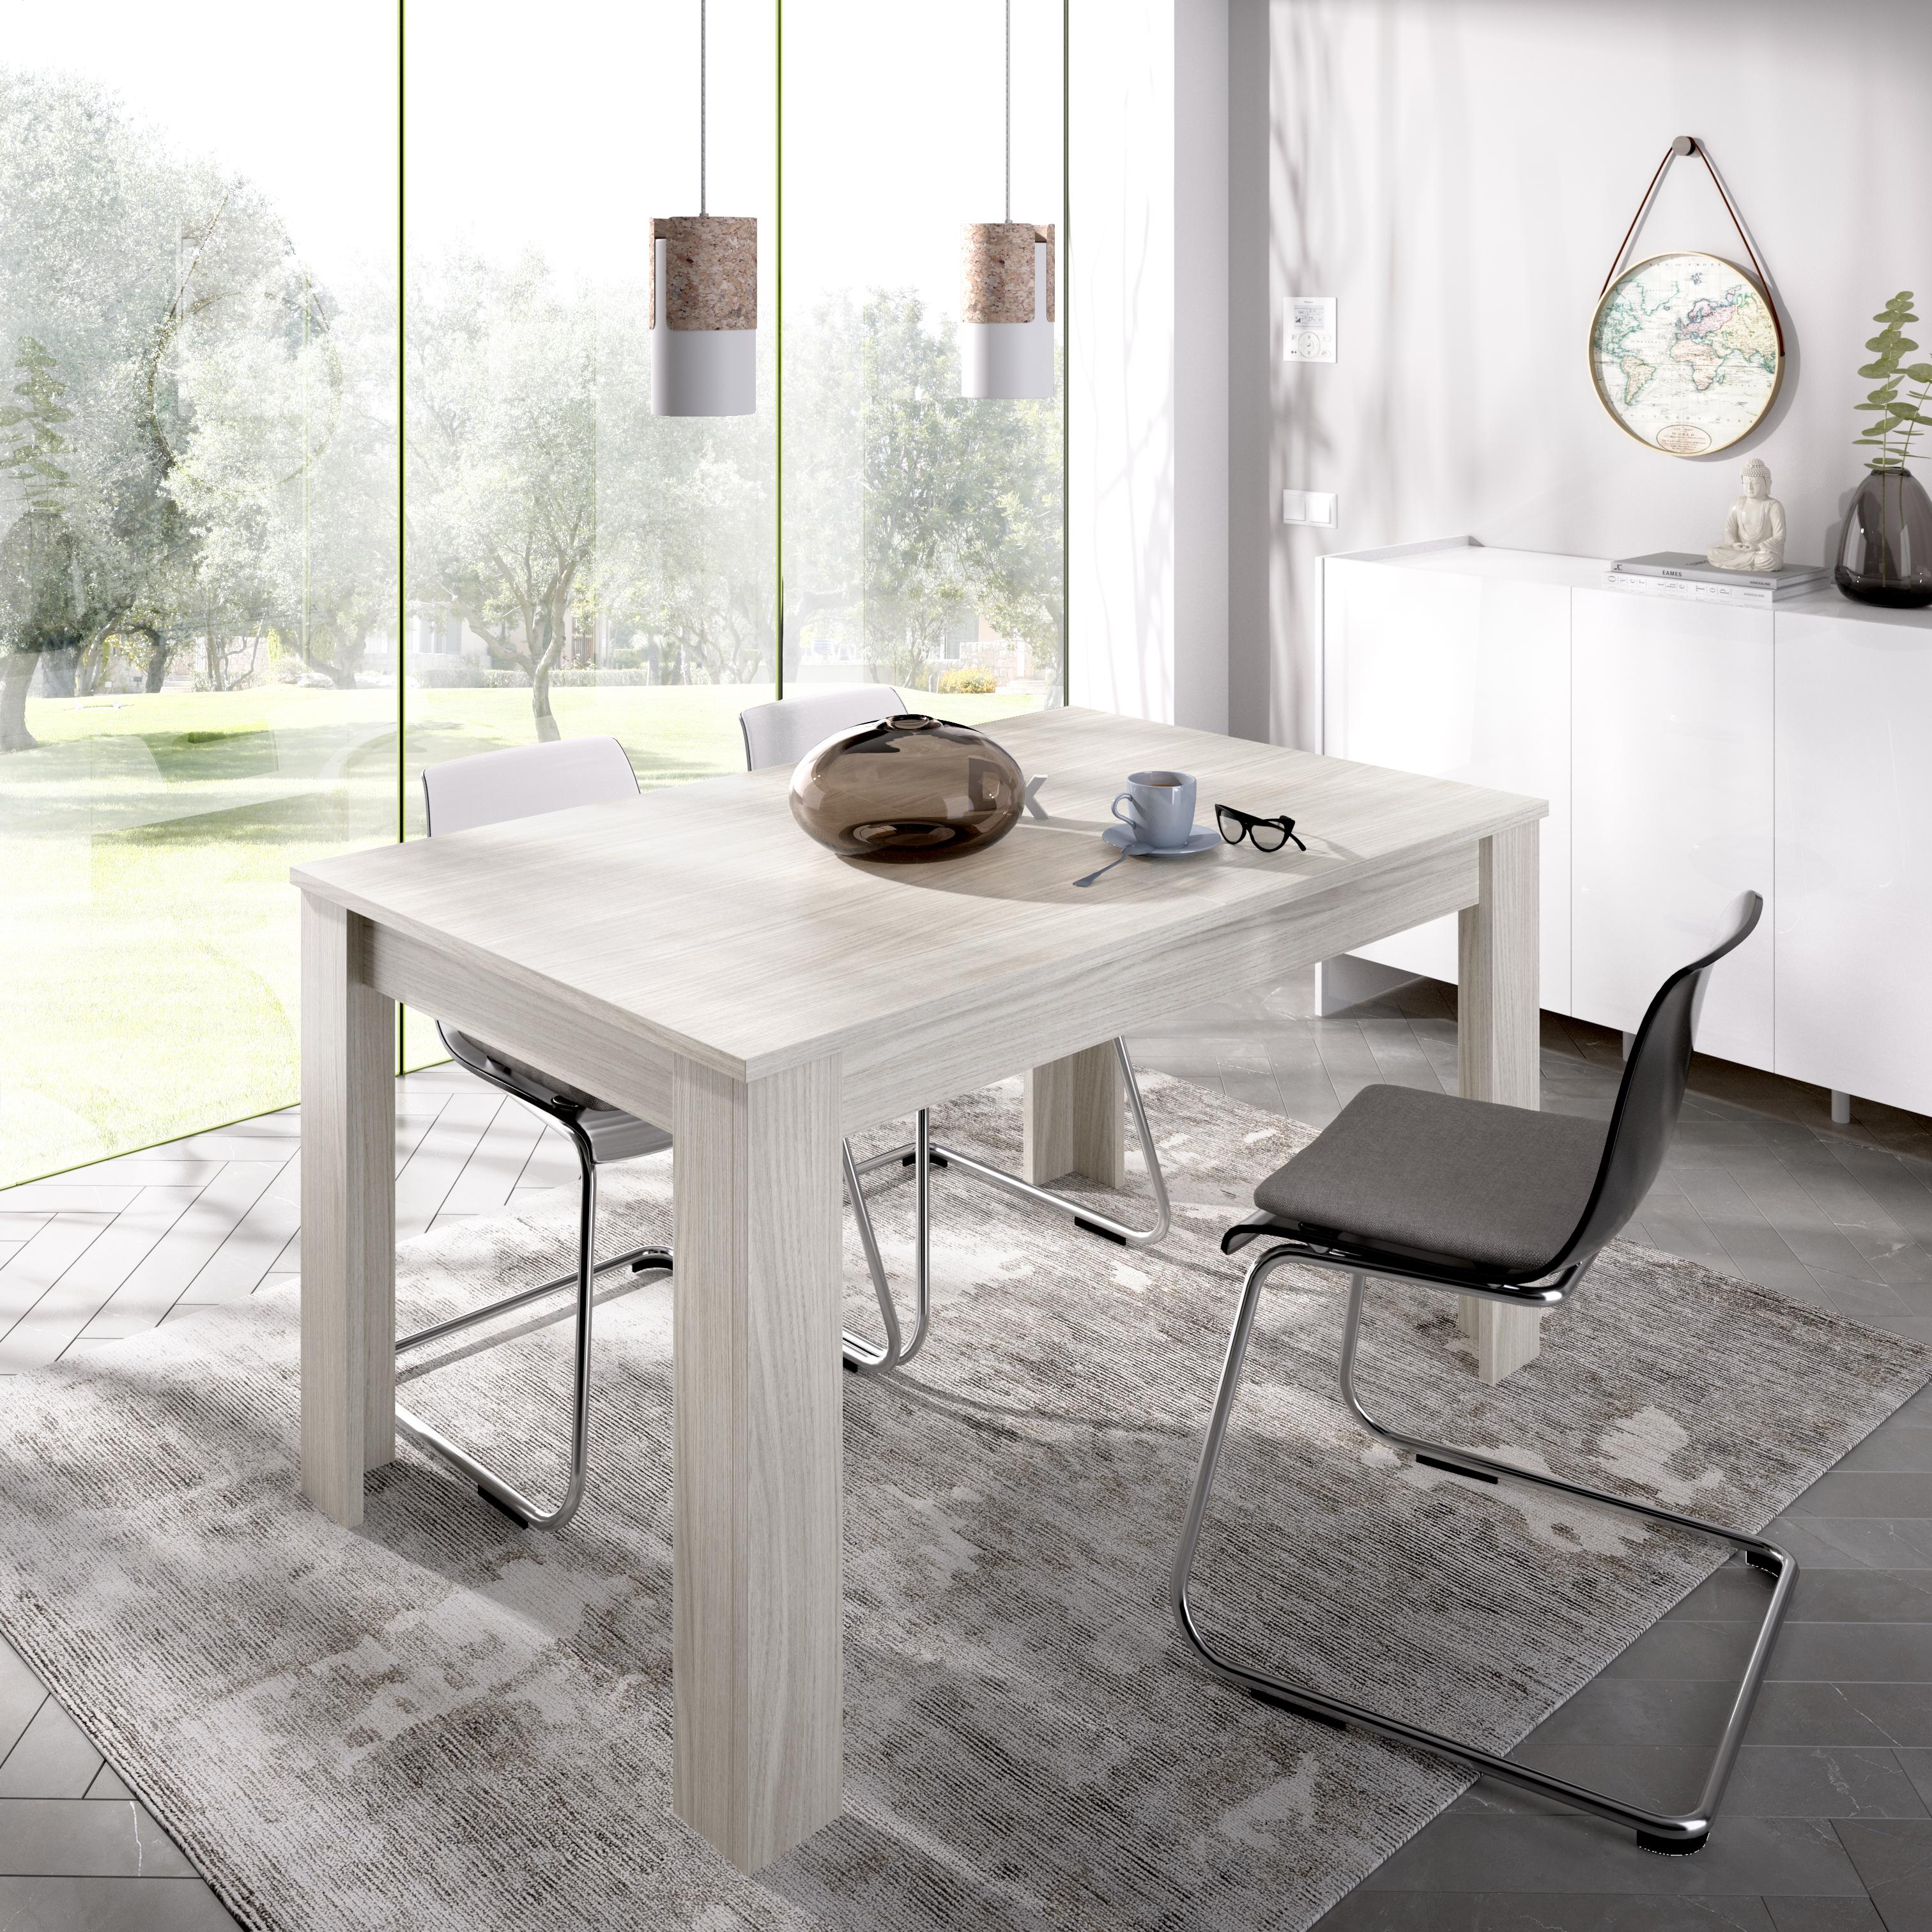 fotos mesa comedor extensible gris, blanca o natural dana 140x90 cm